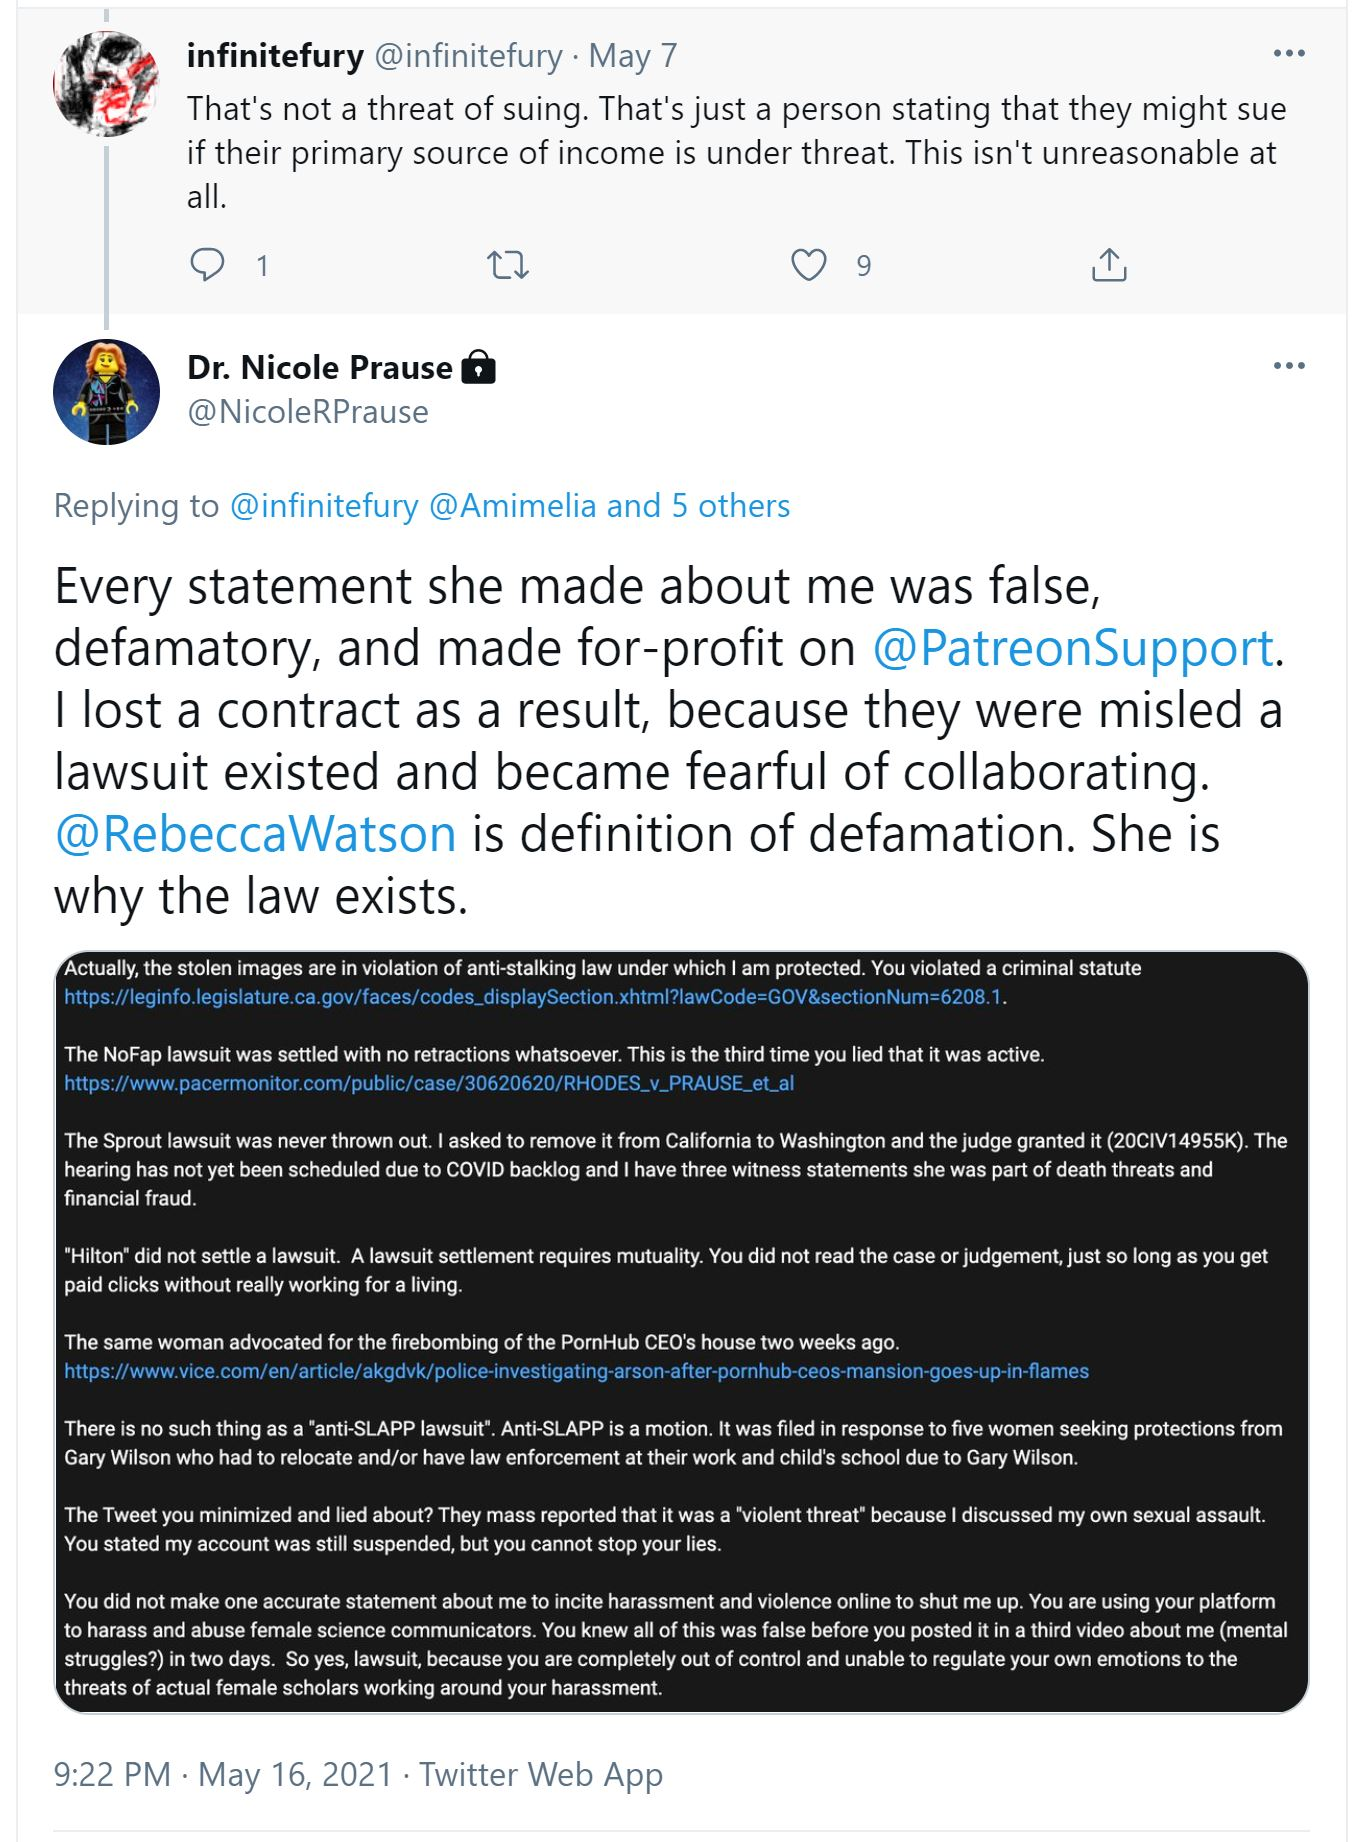 Nicole R Prause and Liberos LLC cyberstalking